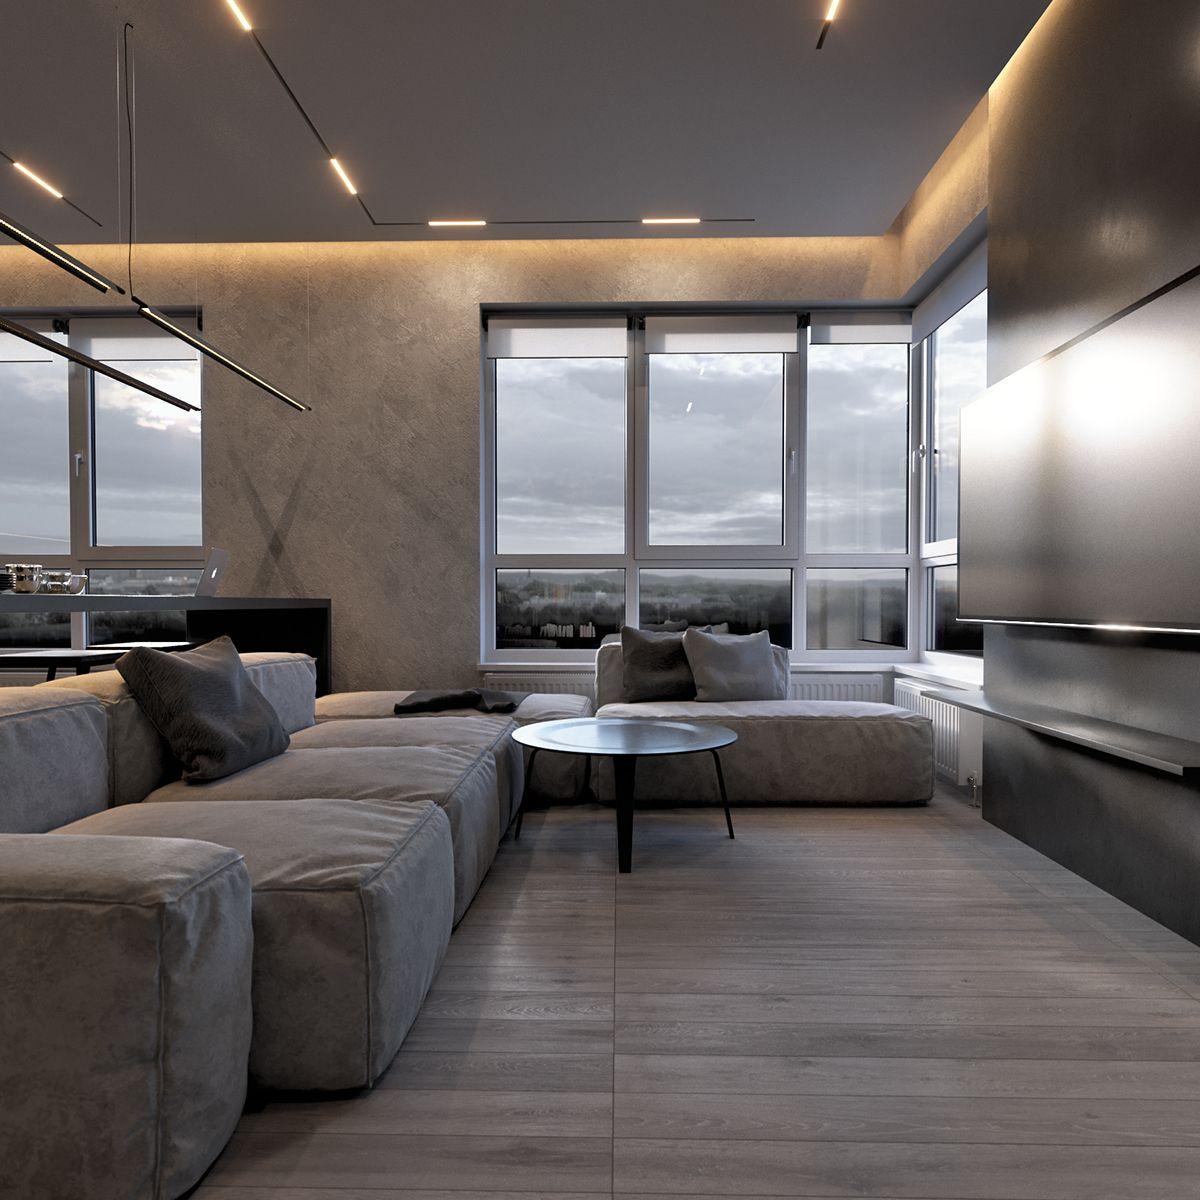 ZARICHNYJ_1 on Behance Home room design, Modern white